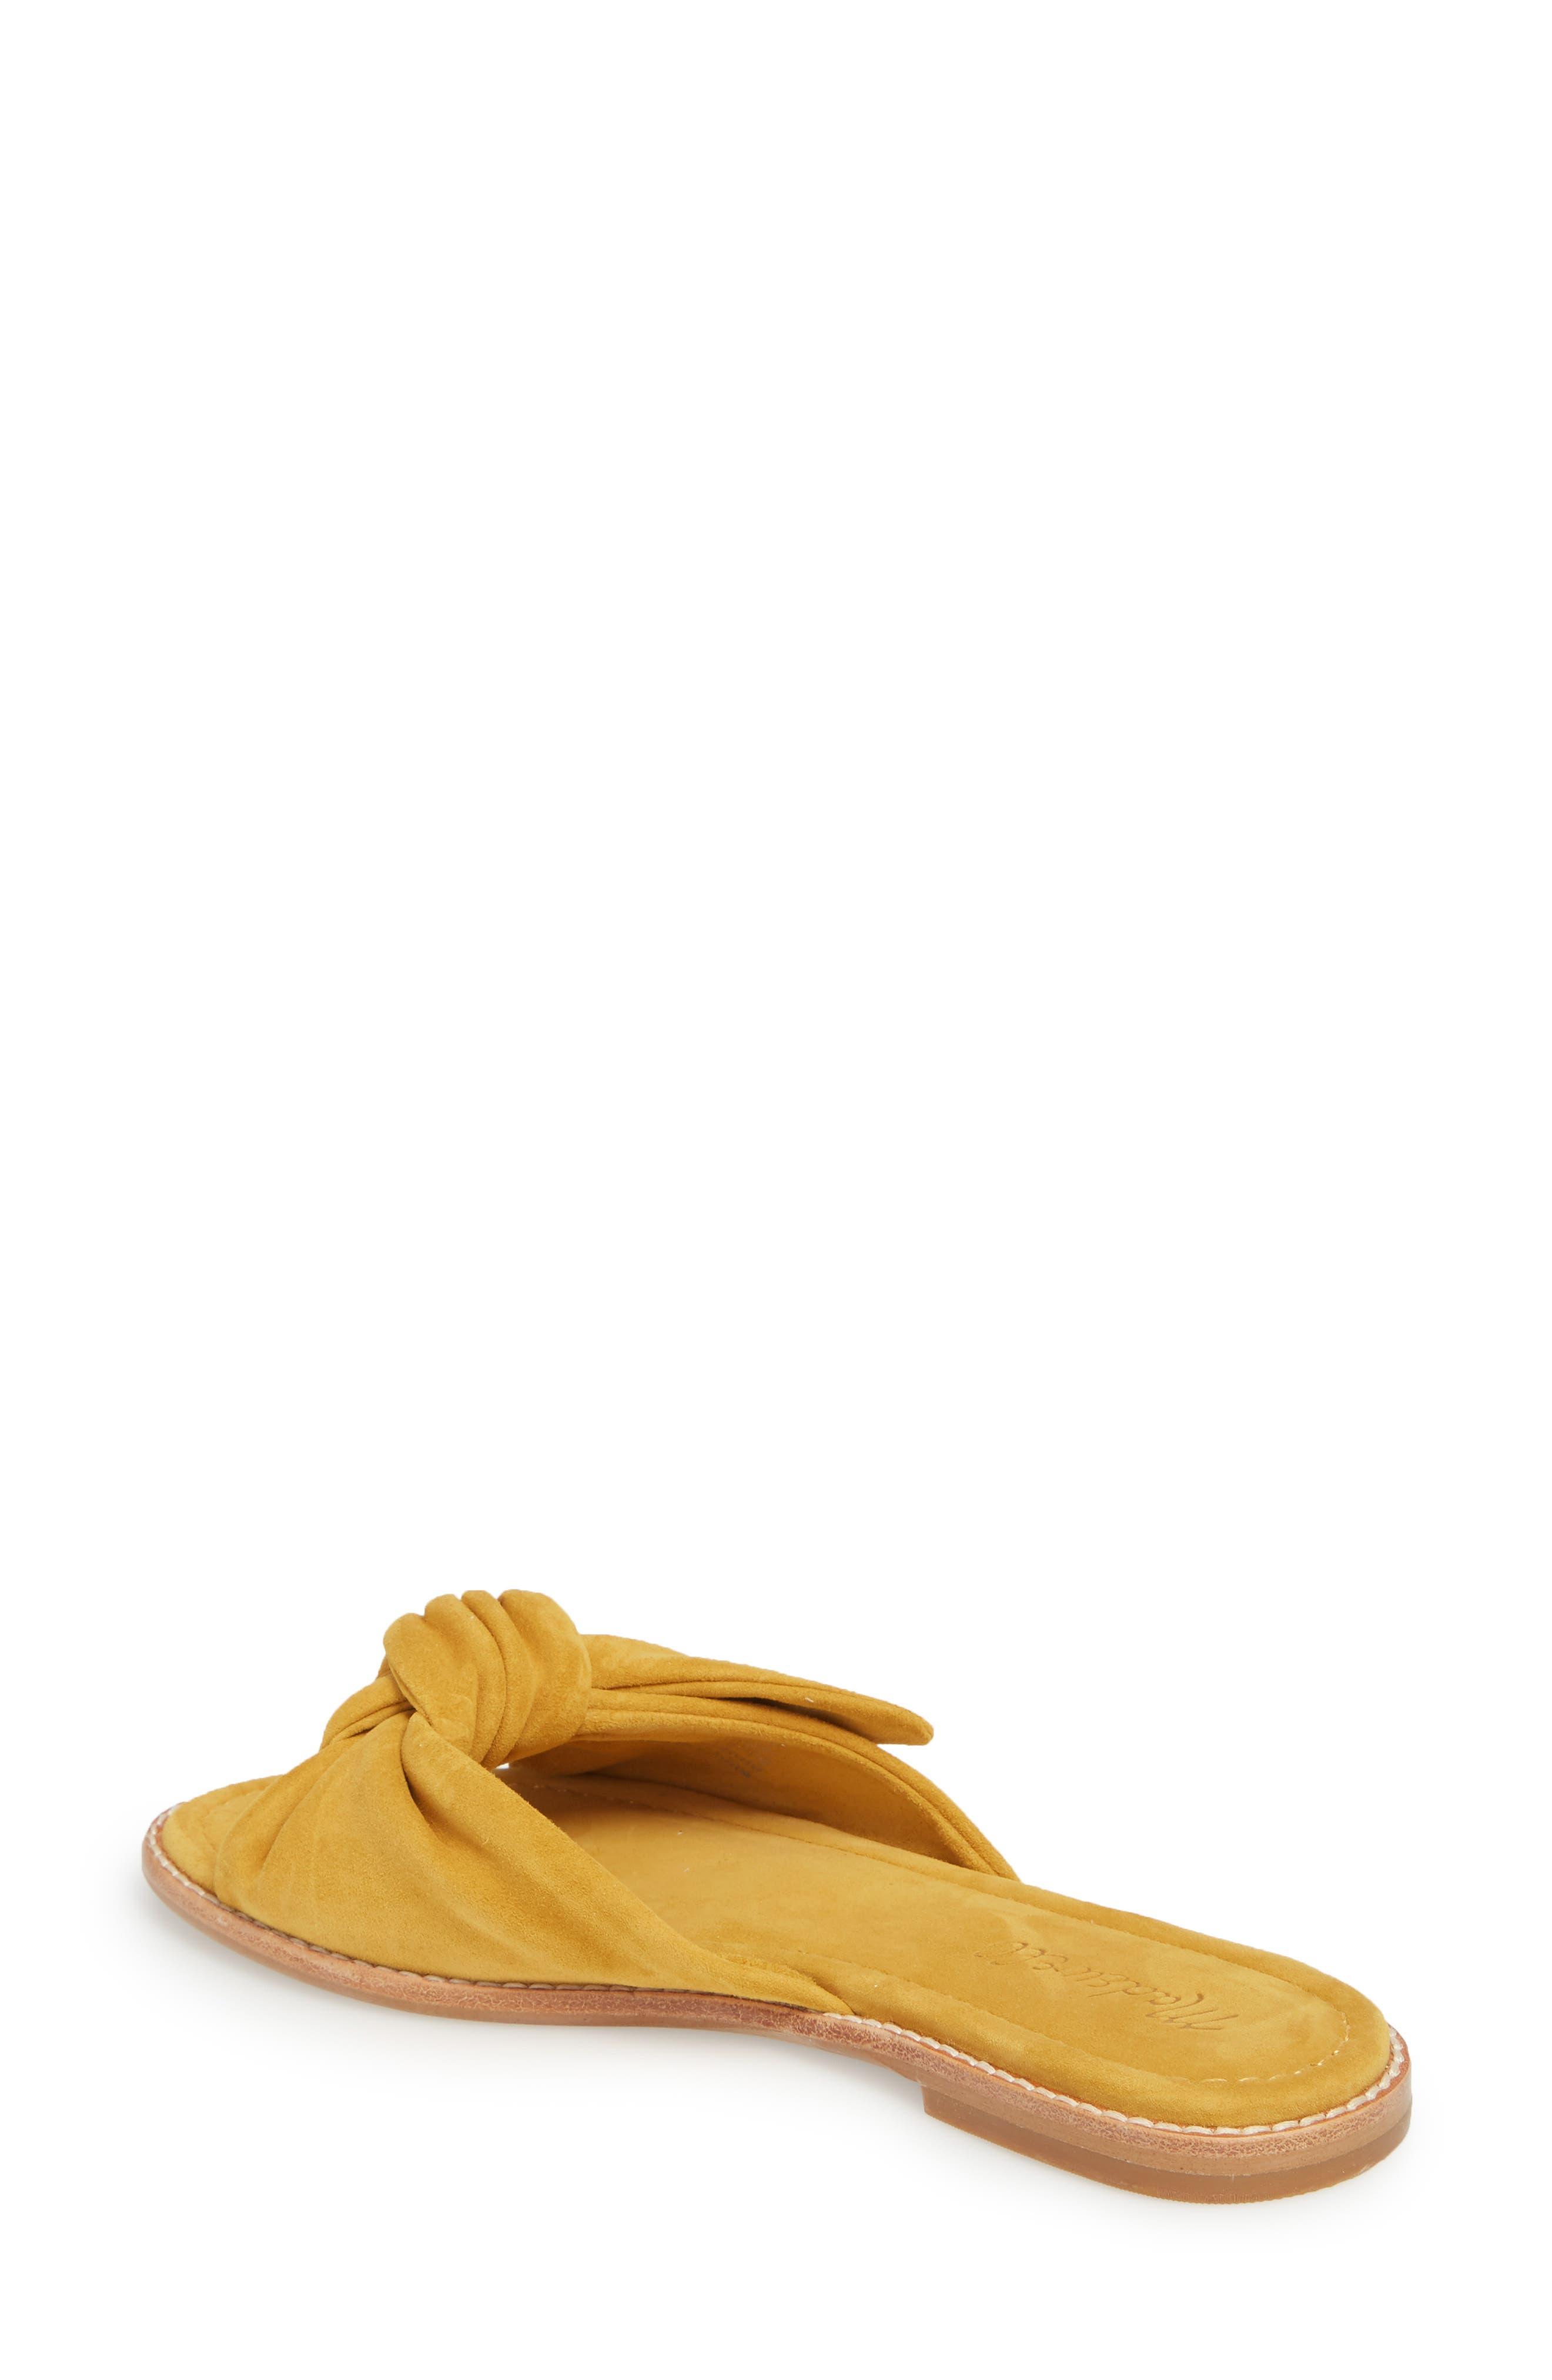 Naida Slide Sandal,                             Alternate thumbnail 2, color,                             Cider Leather